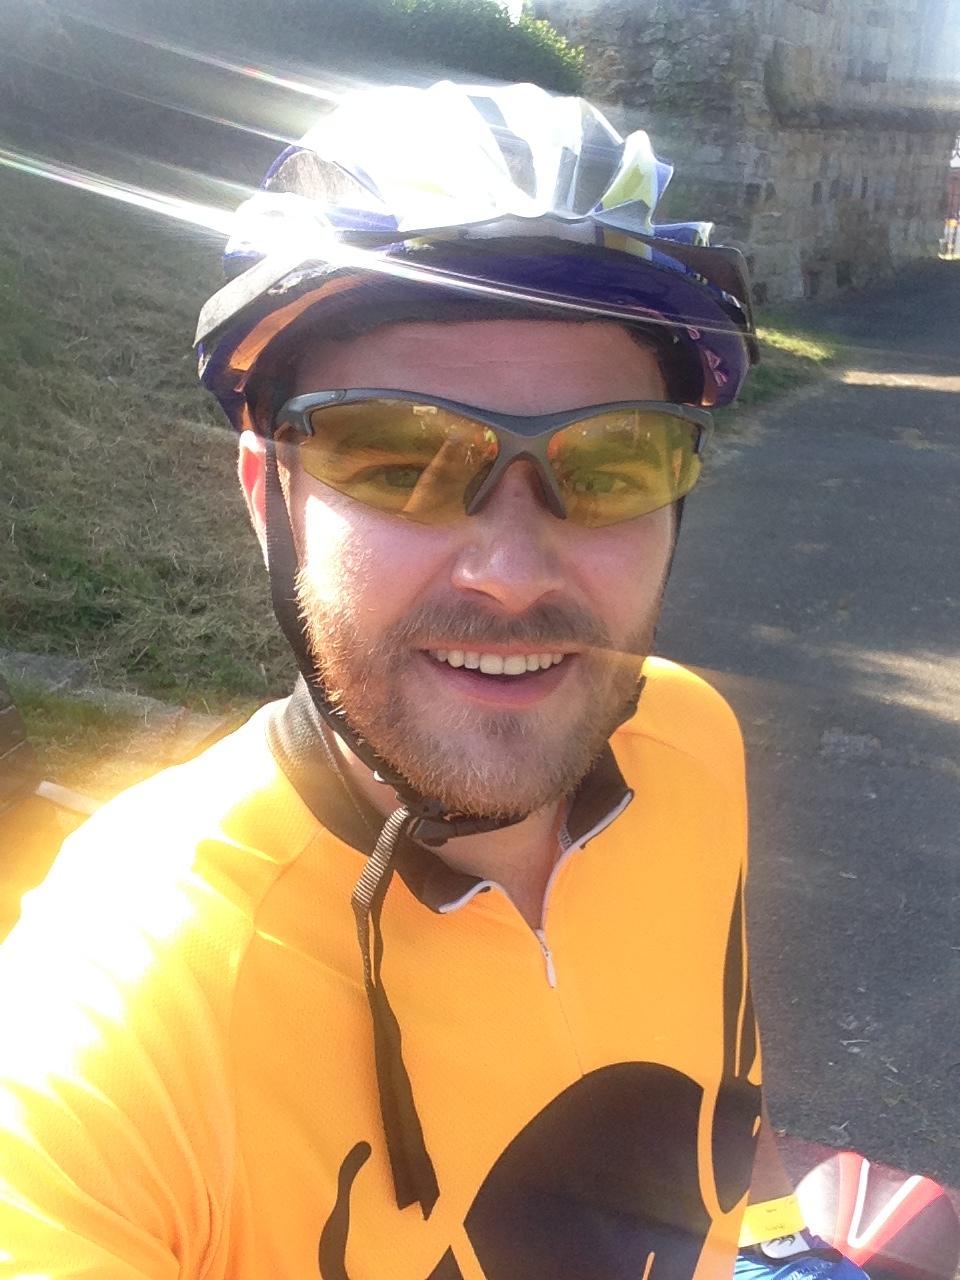 Carl Ellerington - preparing to cycle every mile of John O'Groats to London